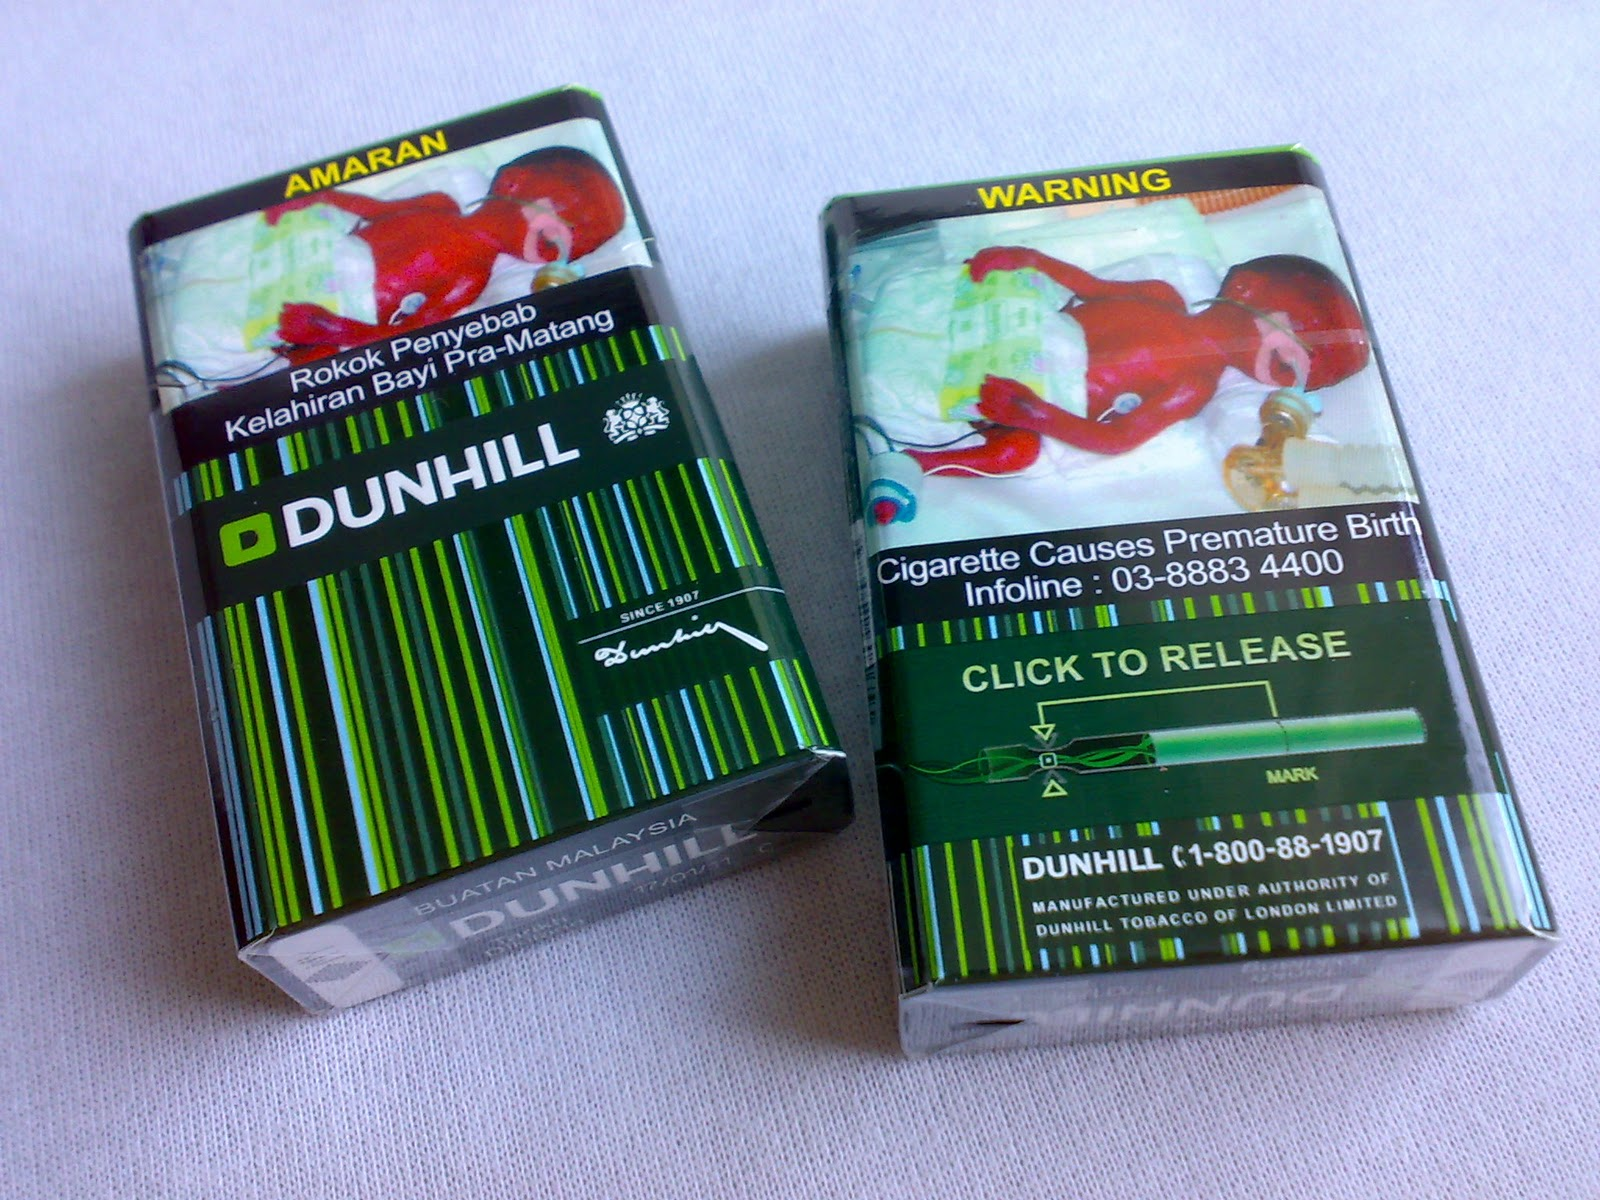 Smoking marlboro light 100s double show feature alhana winter - 4 10